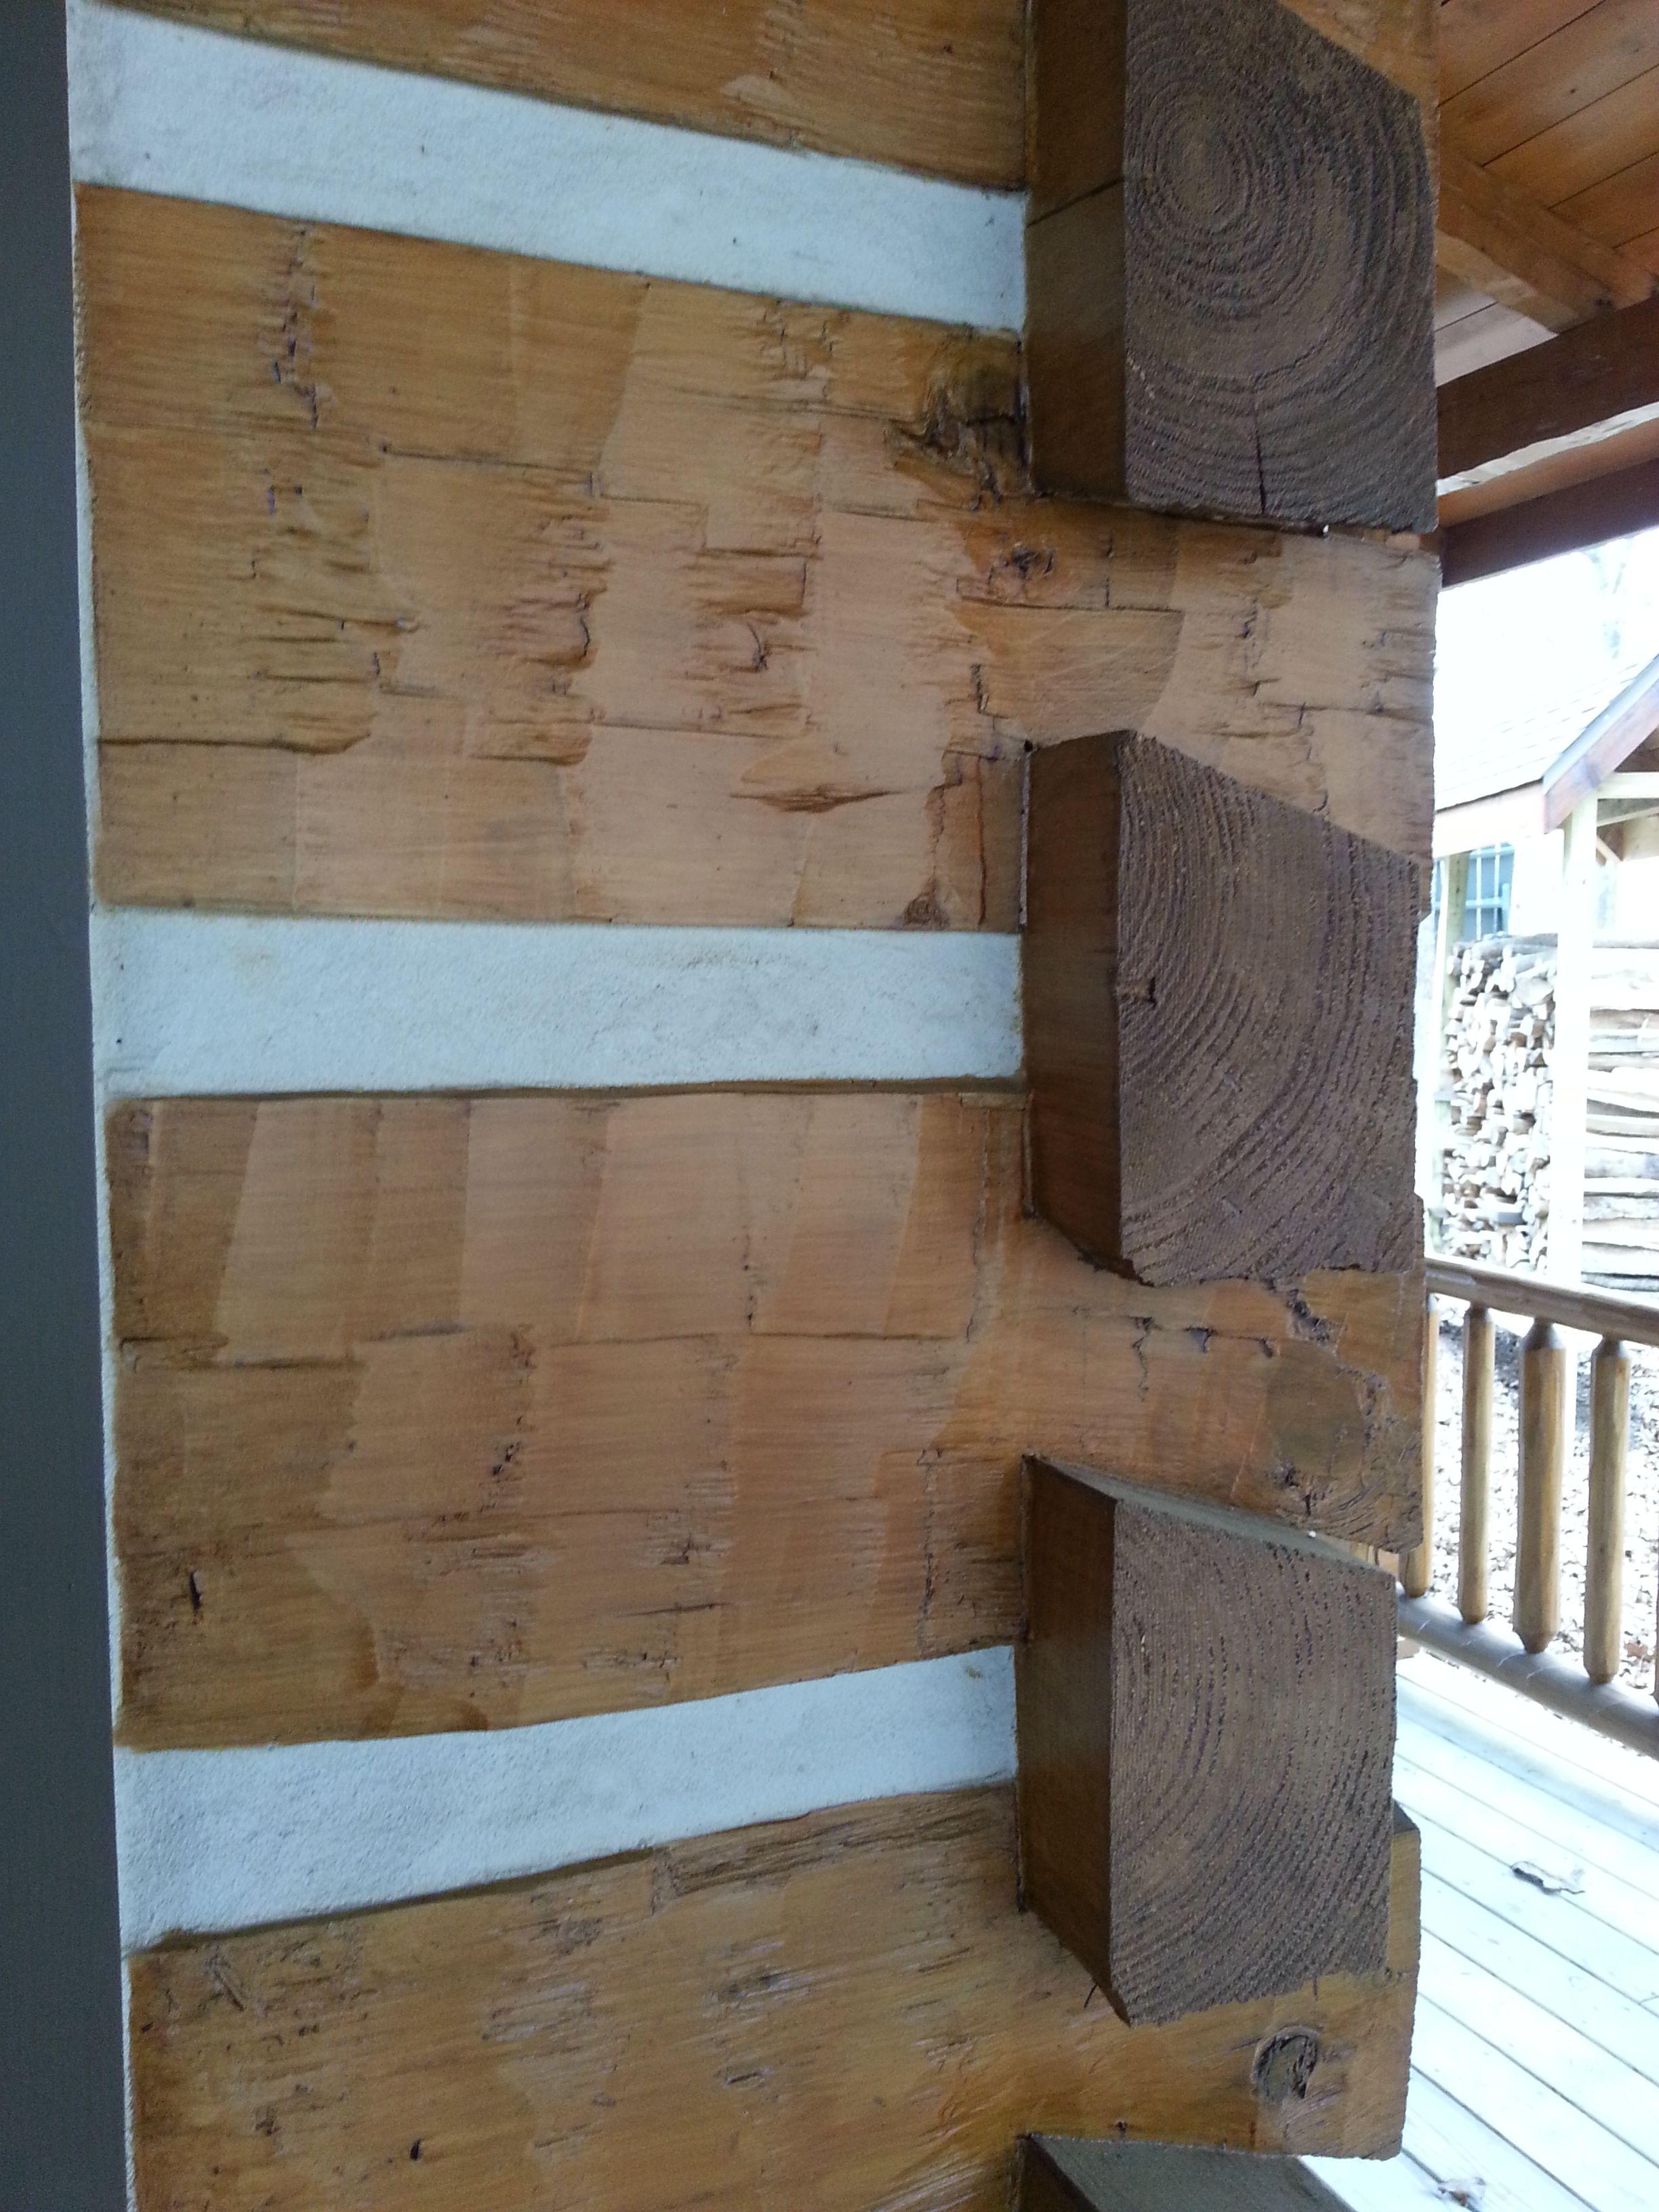 3x8 log siding hand hewn pine - Hand Hewn Log Corner With Chink Groove Chinking Added